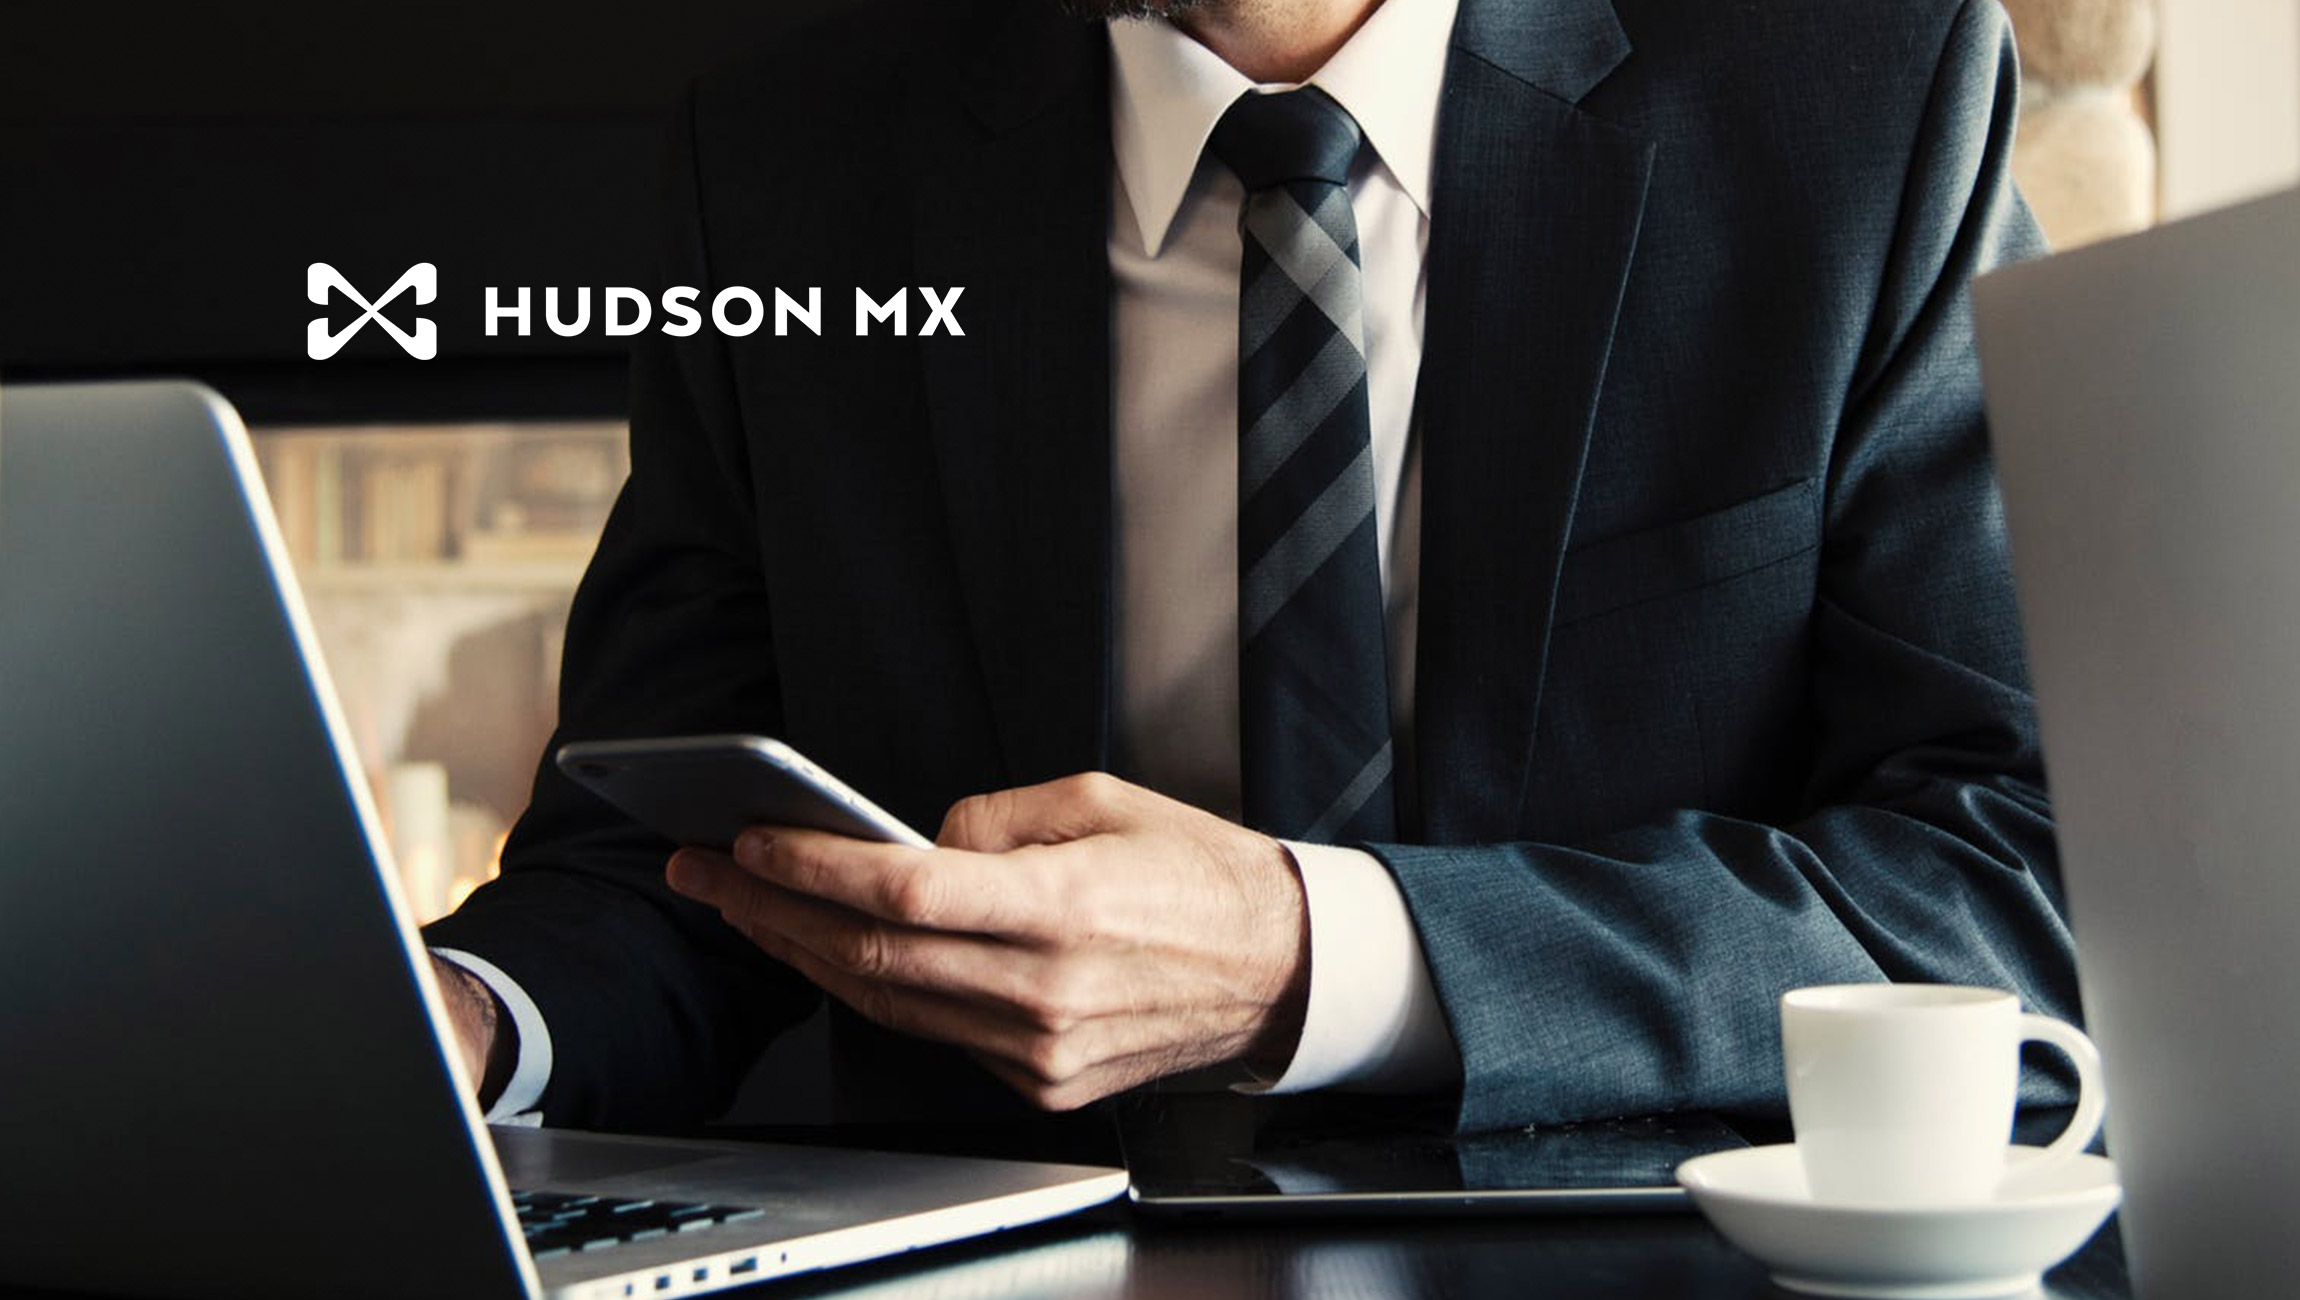 Hudson MX Announces Successful Launch of Local Media Buying Platform